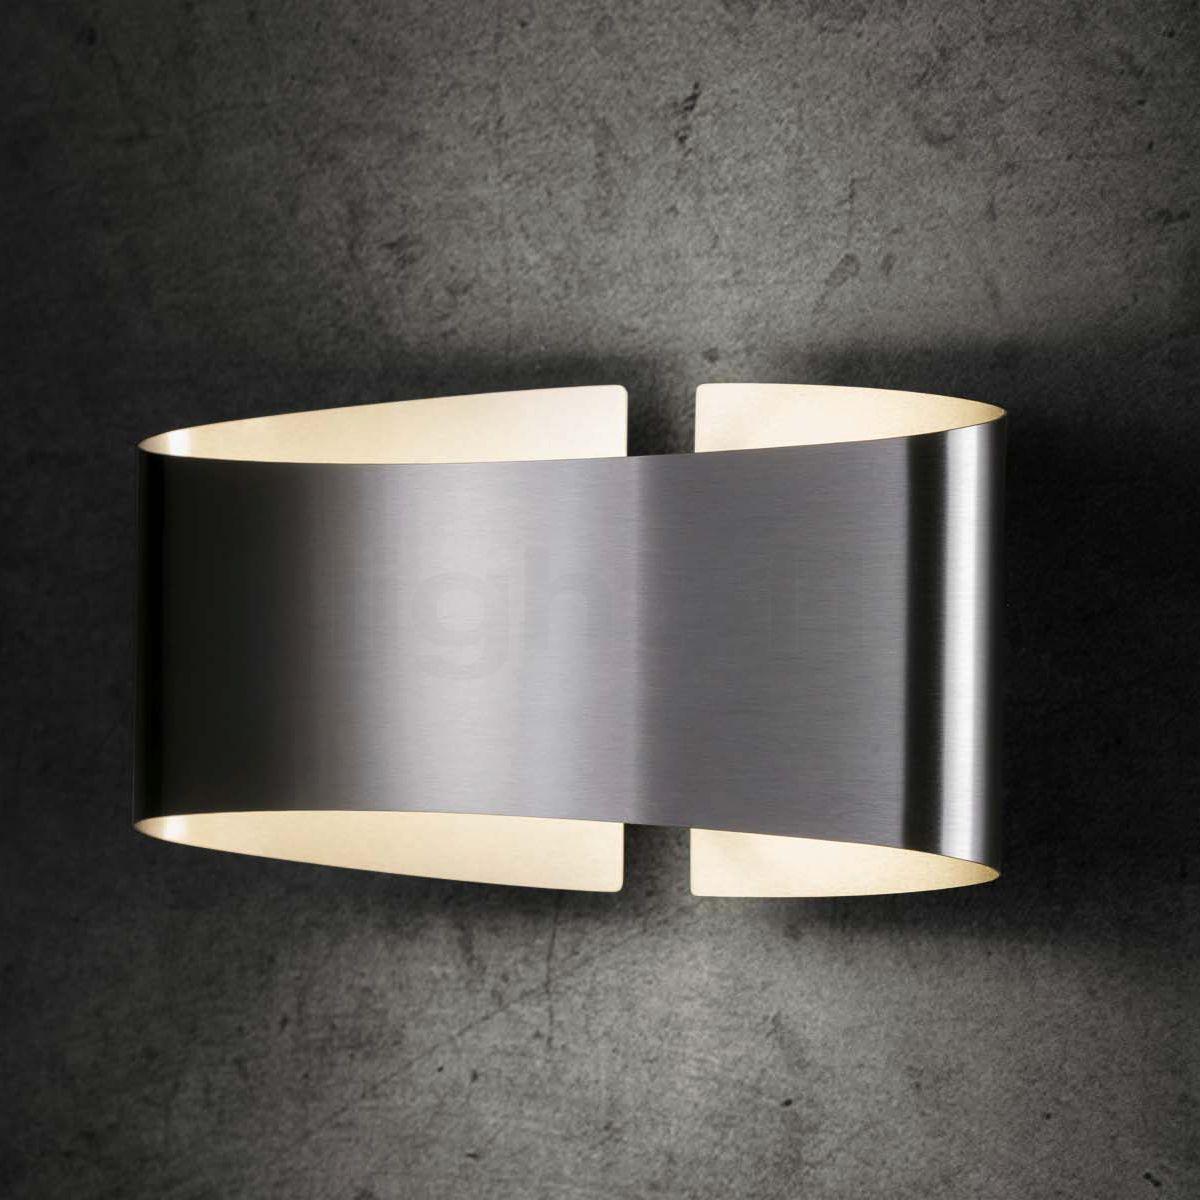 Trendy aparte wandlampen with aparte wandlampen for Aparte lampen